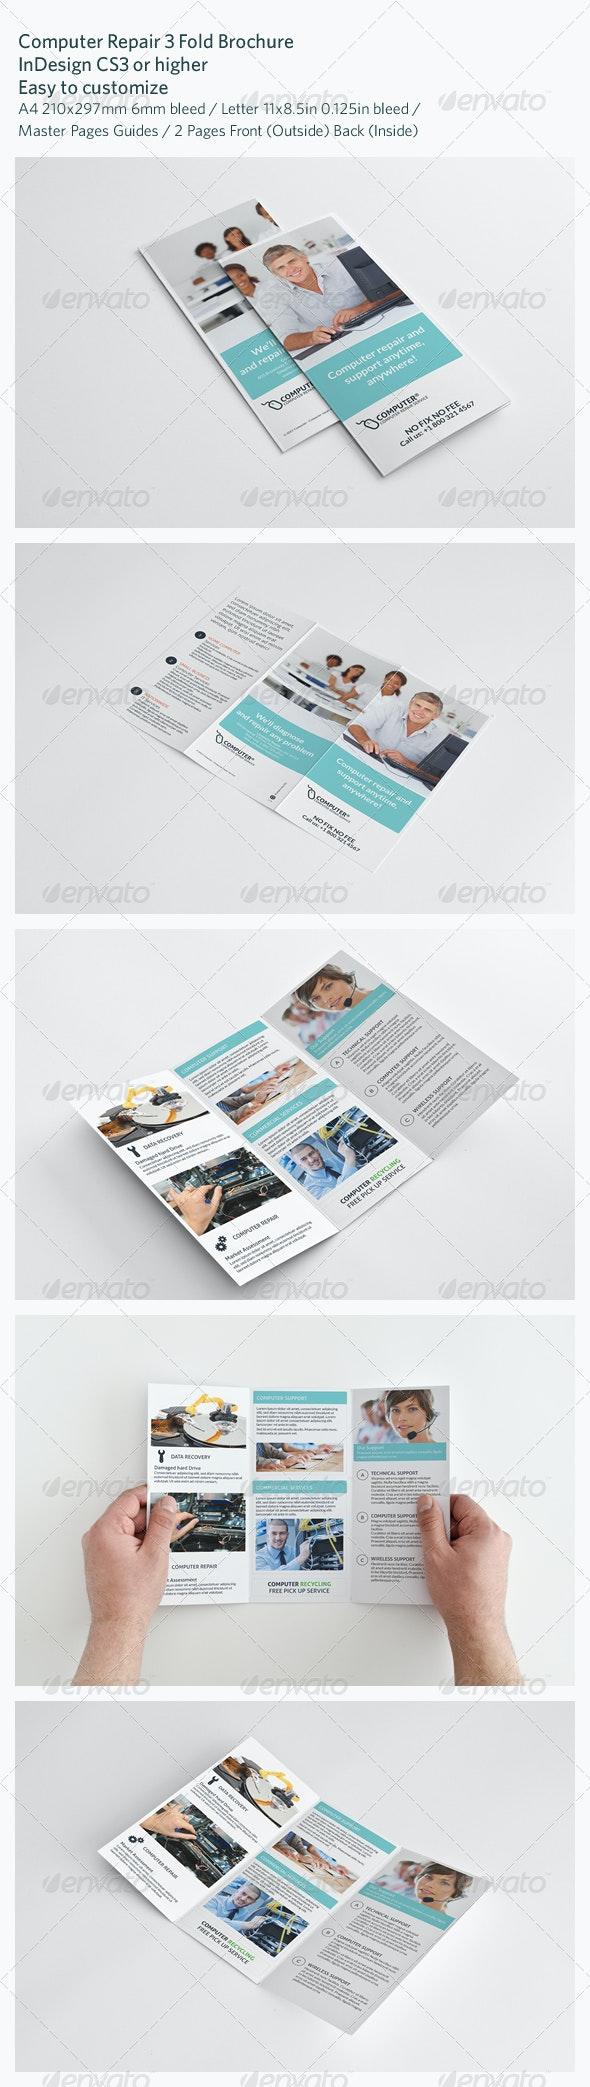 Computer Repair 3 Fold Brochure - Brochures Print Templates